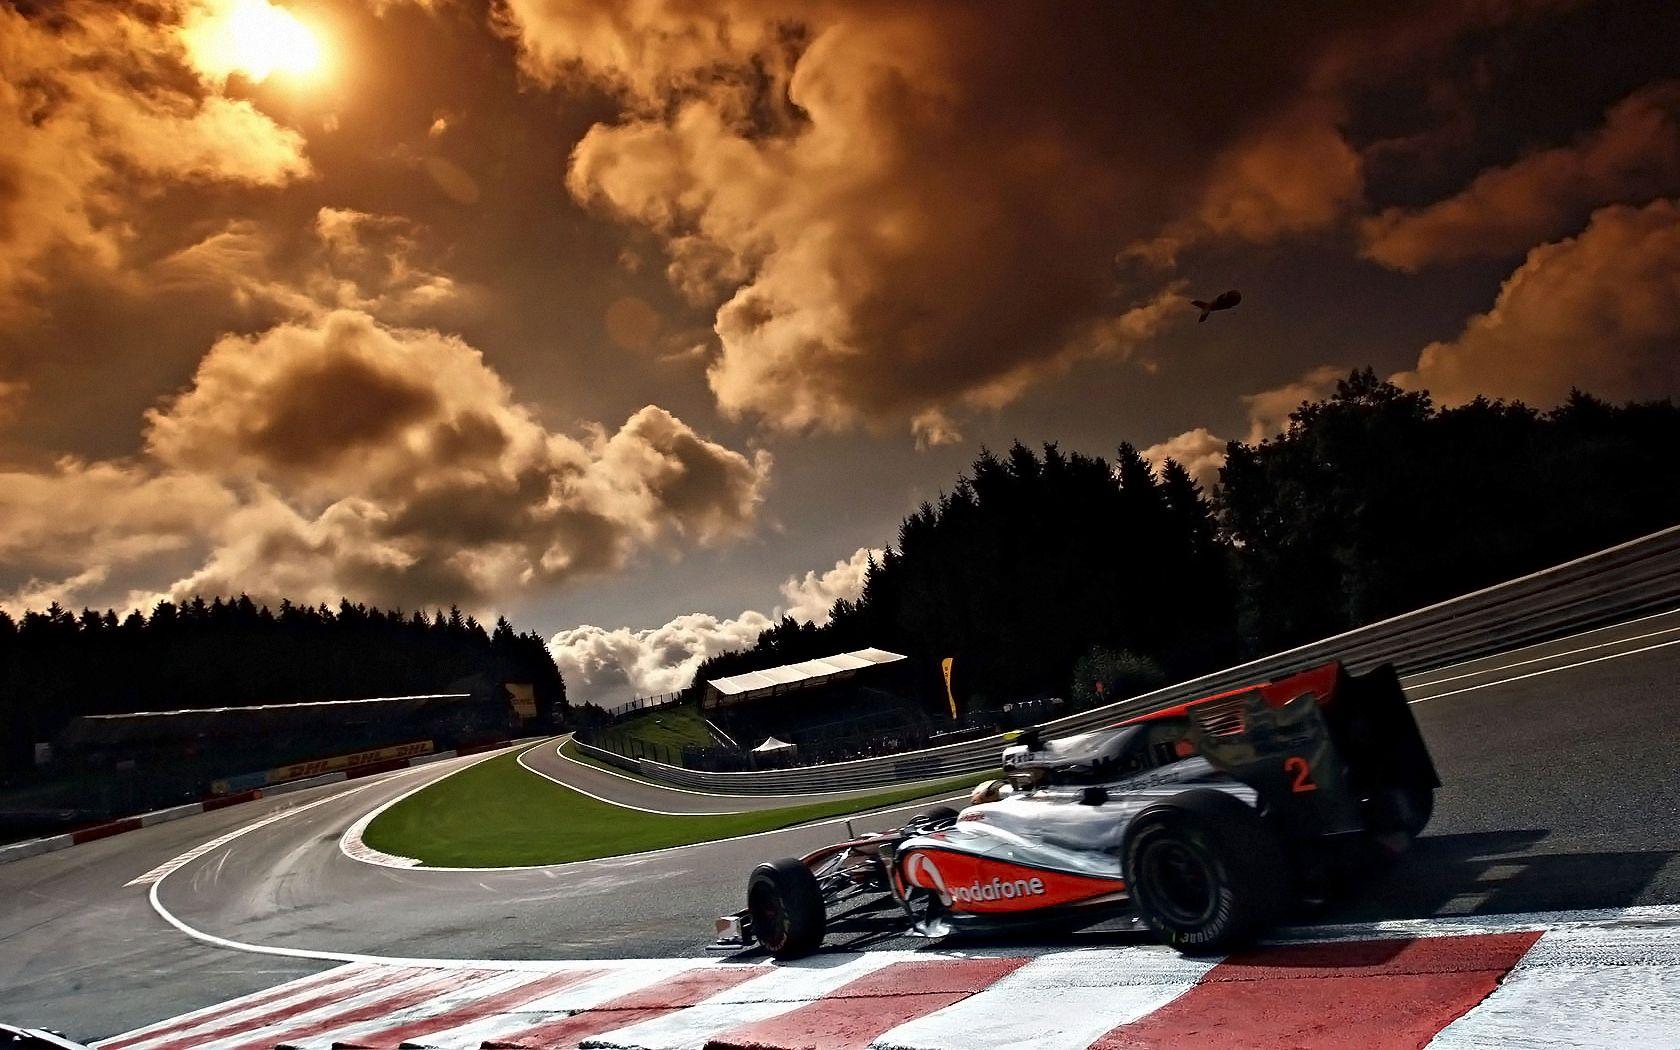 Mclarennn Formula 1 British Grand Prix Belgian Grand Prix